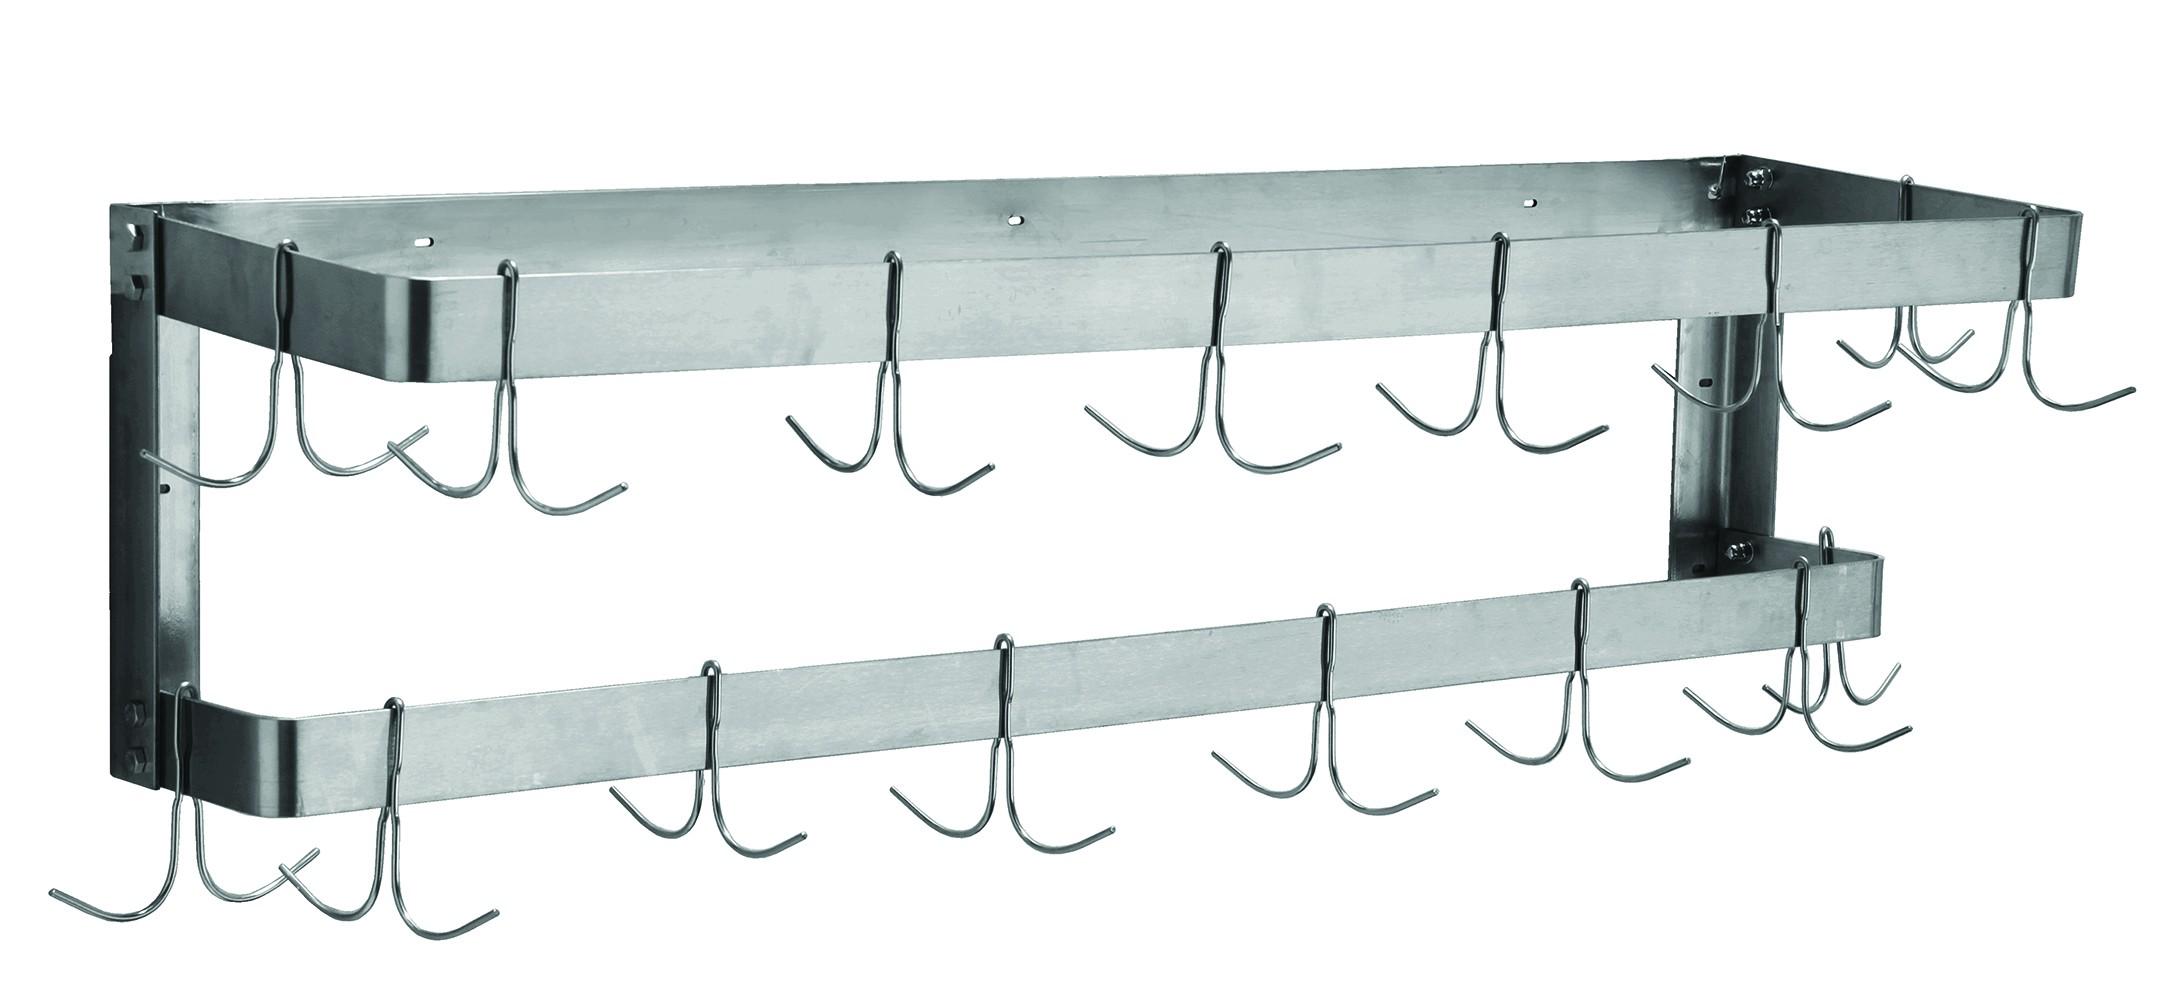 tray shower chrome tub shelf wall modern steel corner caddy acrylic rack stainless bath the mount over bathtub